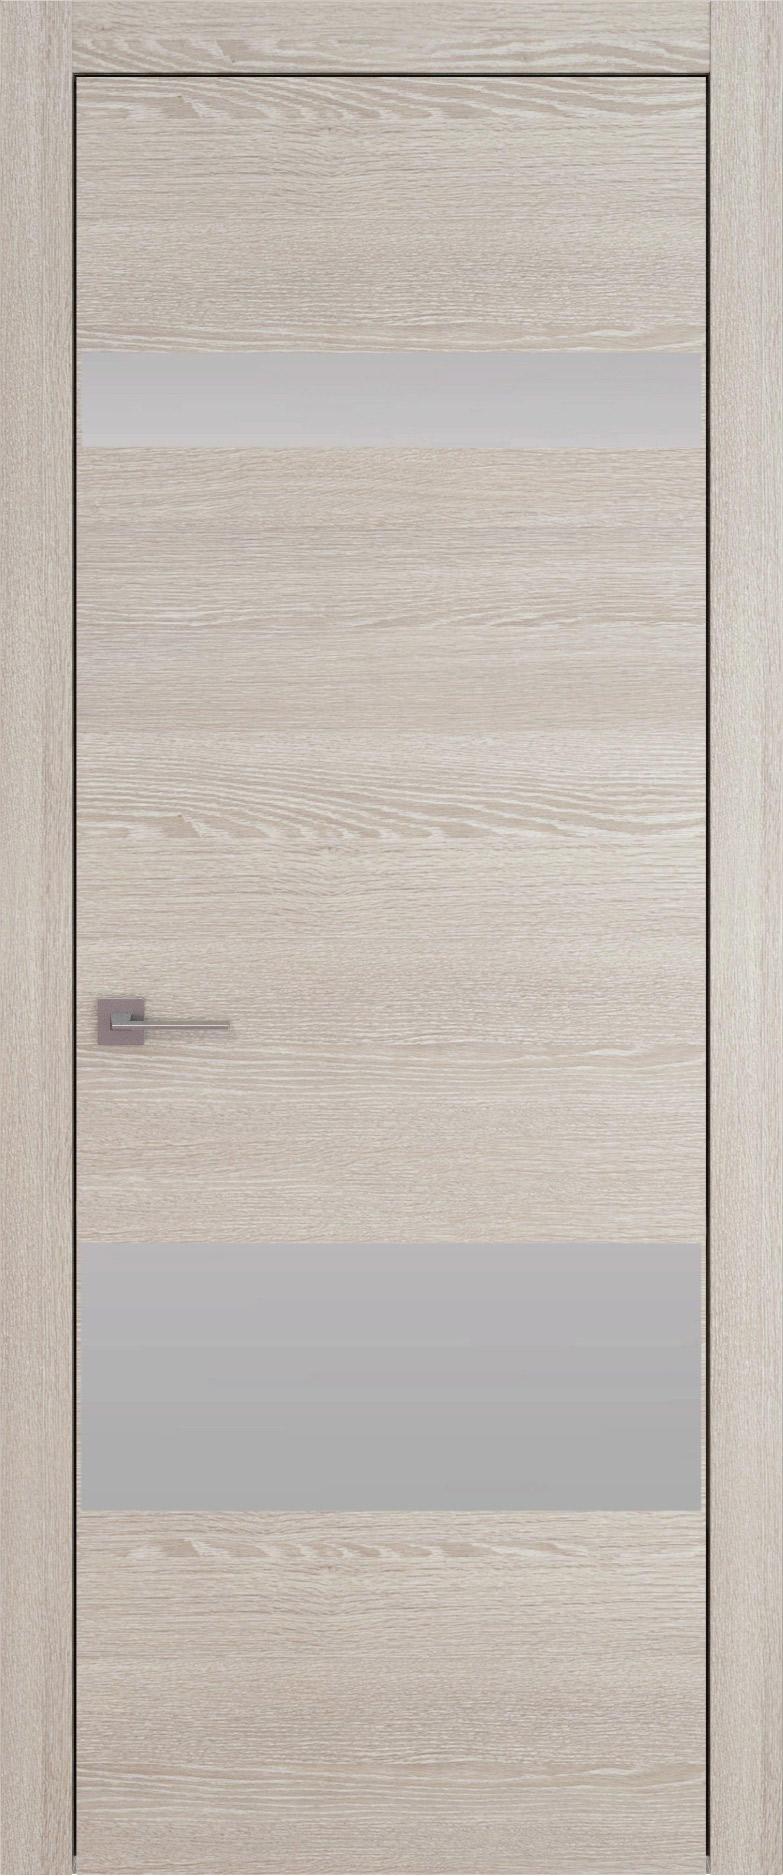 Tivoli К-4 цвет - Серый дуб Без стекла (ДГ)